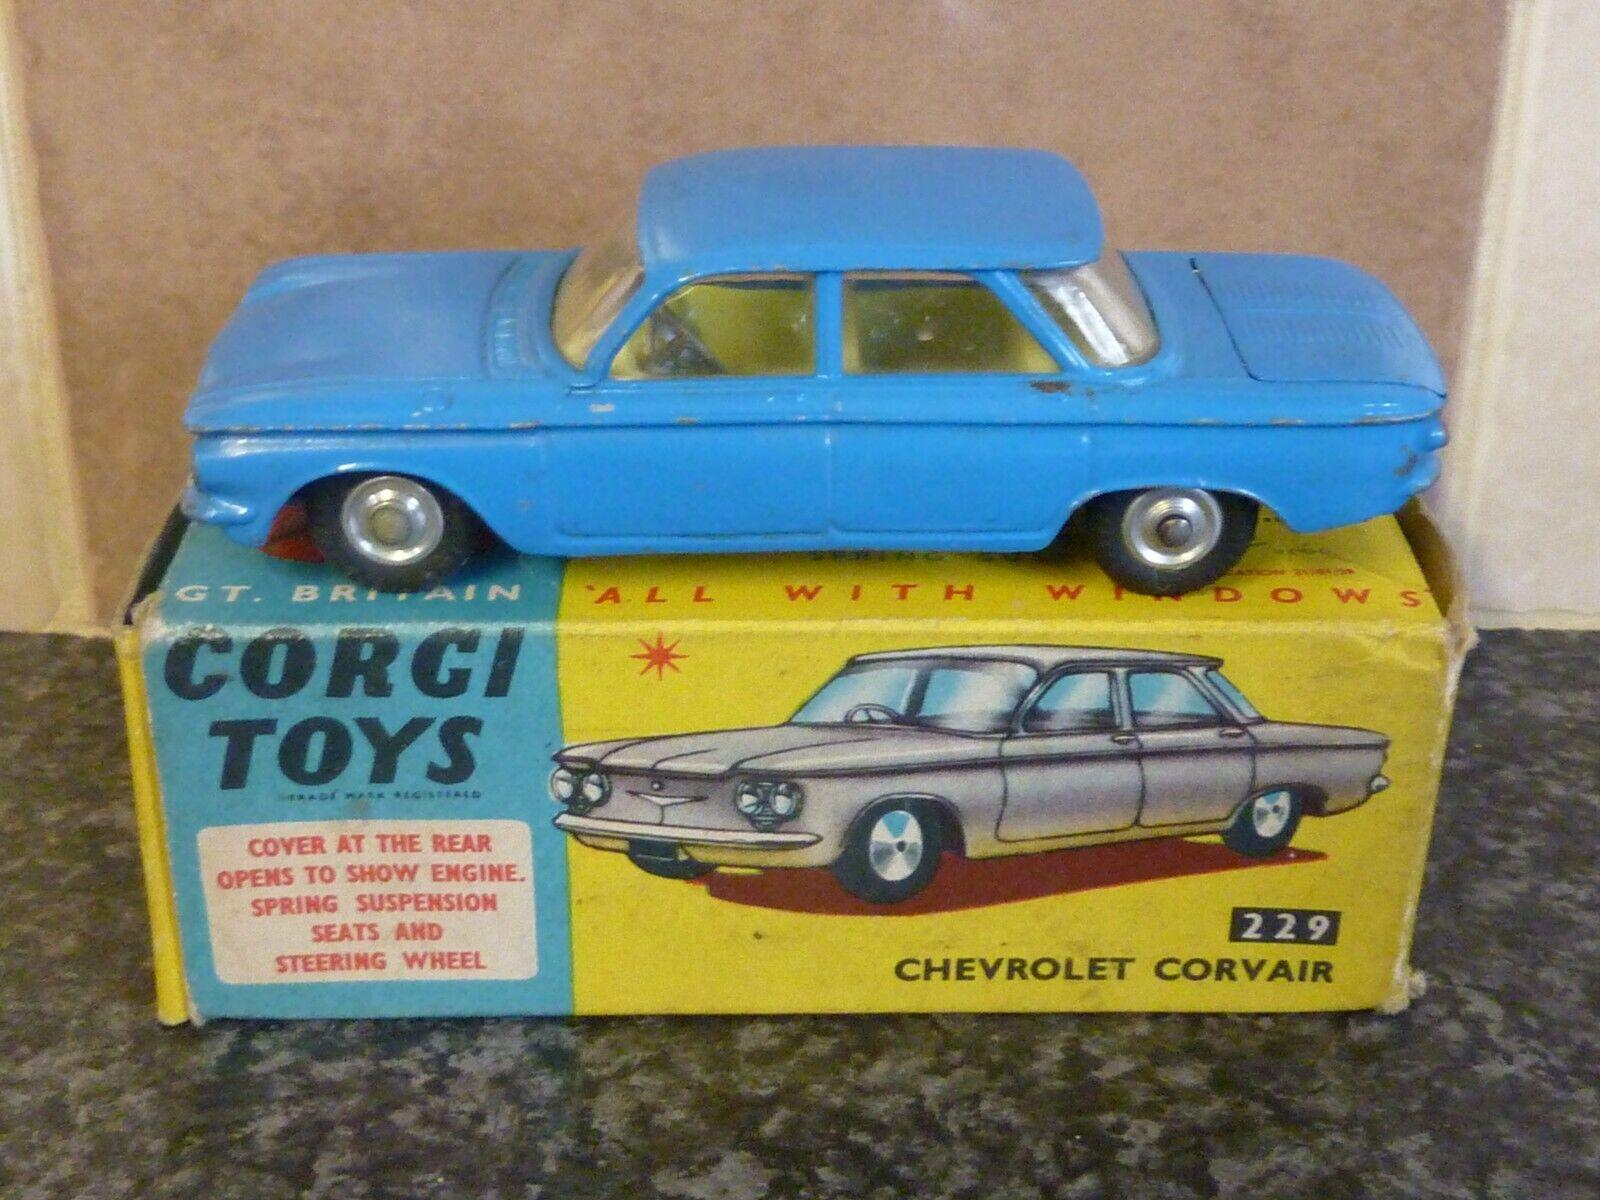 VINTAGE CORGI TOYS No.229 CHEVROLET CORVAIR blueE BOXED VGC FOR AGE